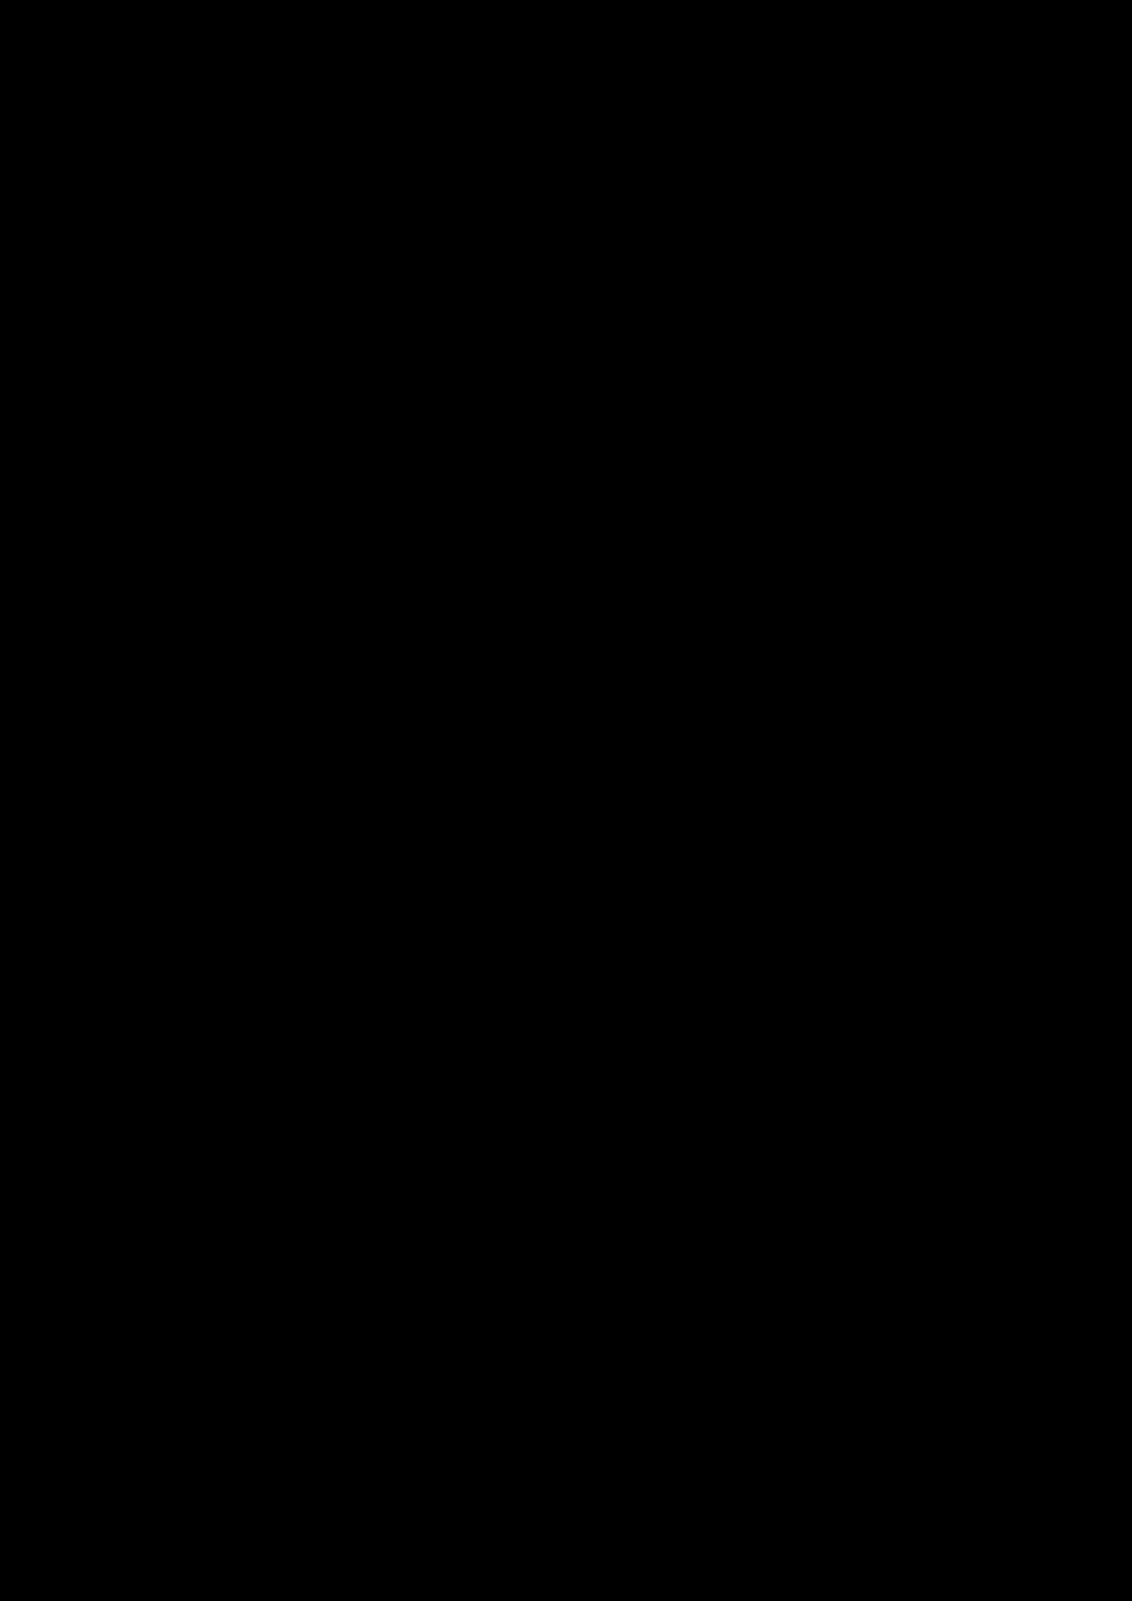 Belyiy sokol slide, Image 67